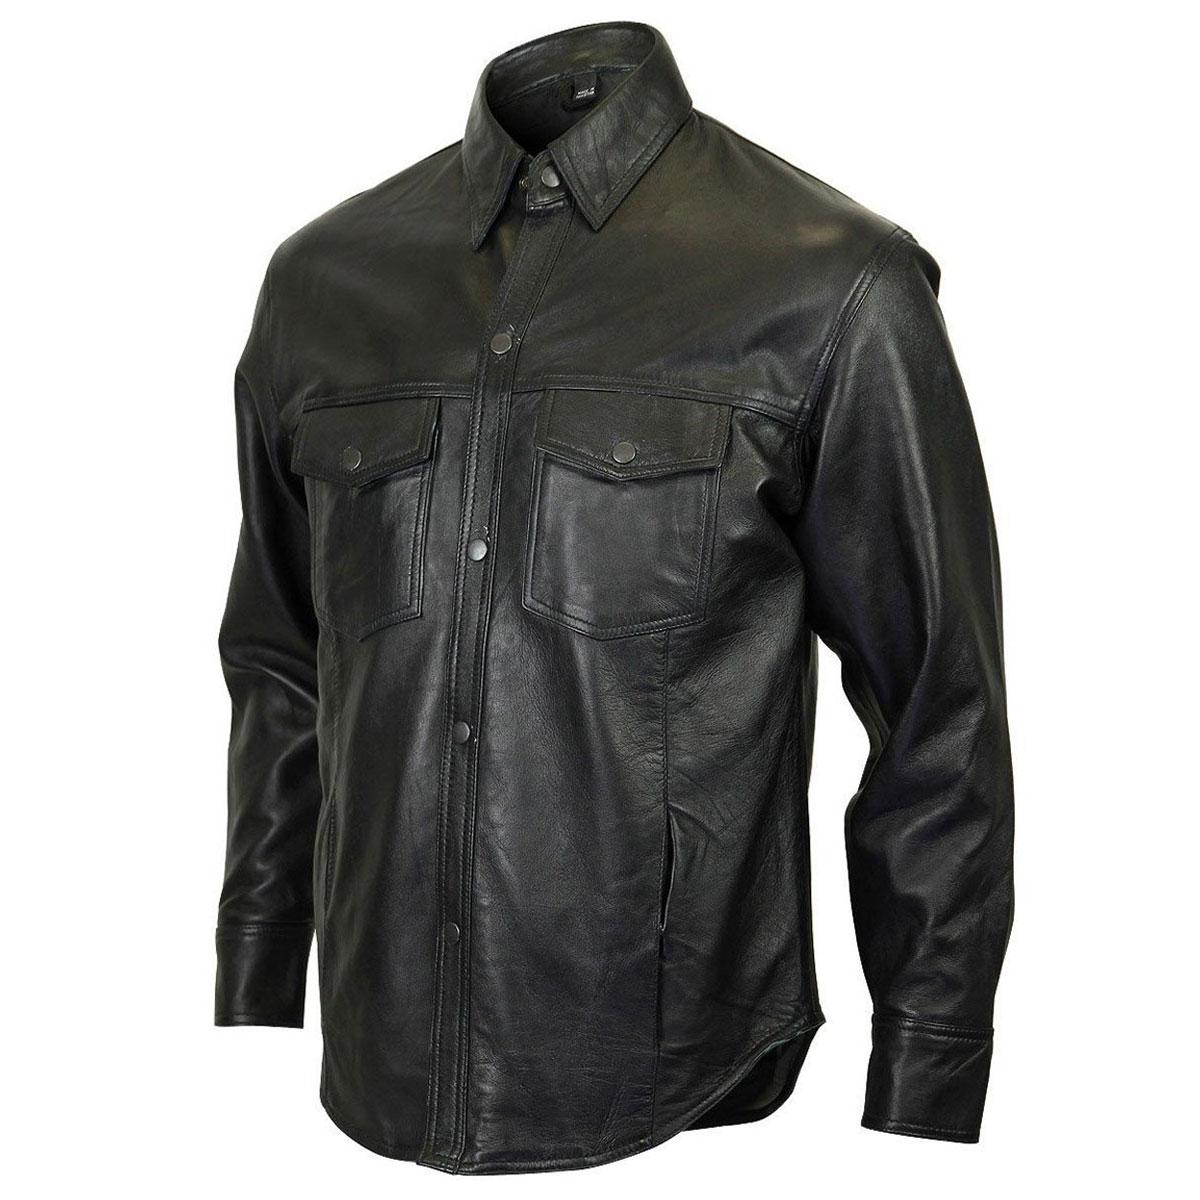 Vance Leathers Men's Lambskin Black Leather Shirt